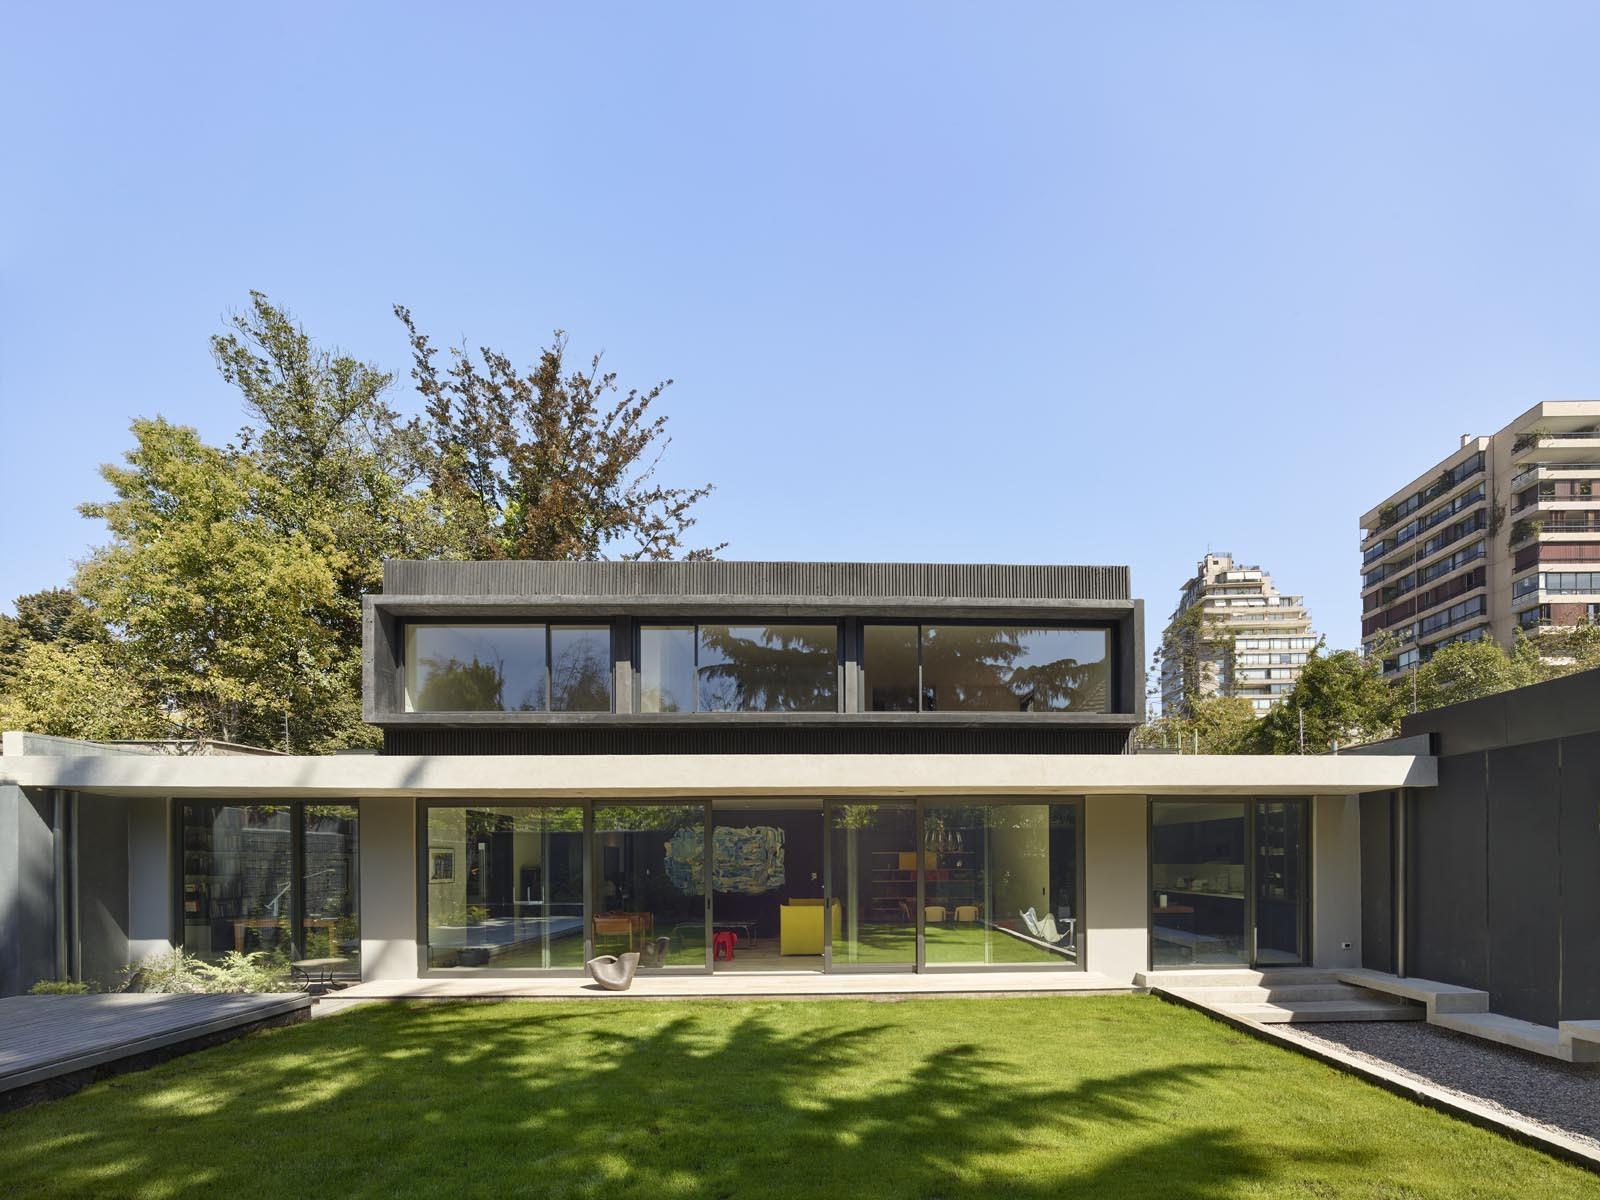 Gallery of malaga house prietoschaffer arquitectos 1 - Arquitectos interioristas malaga ...